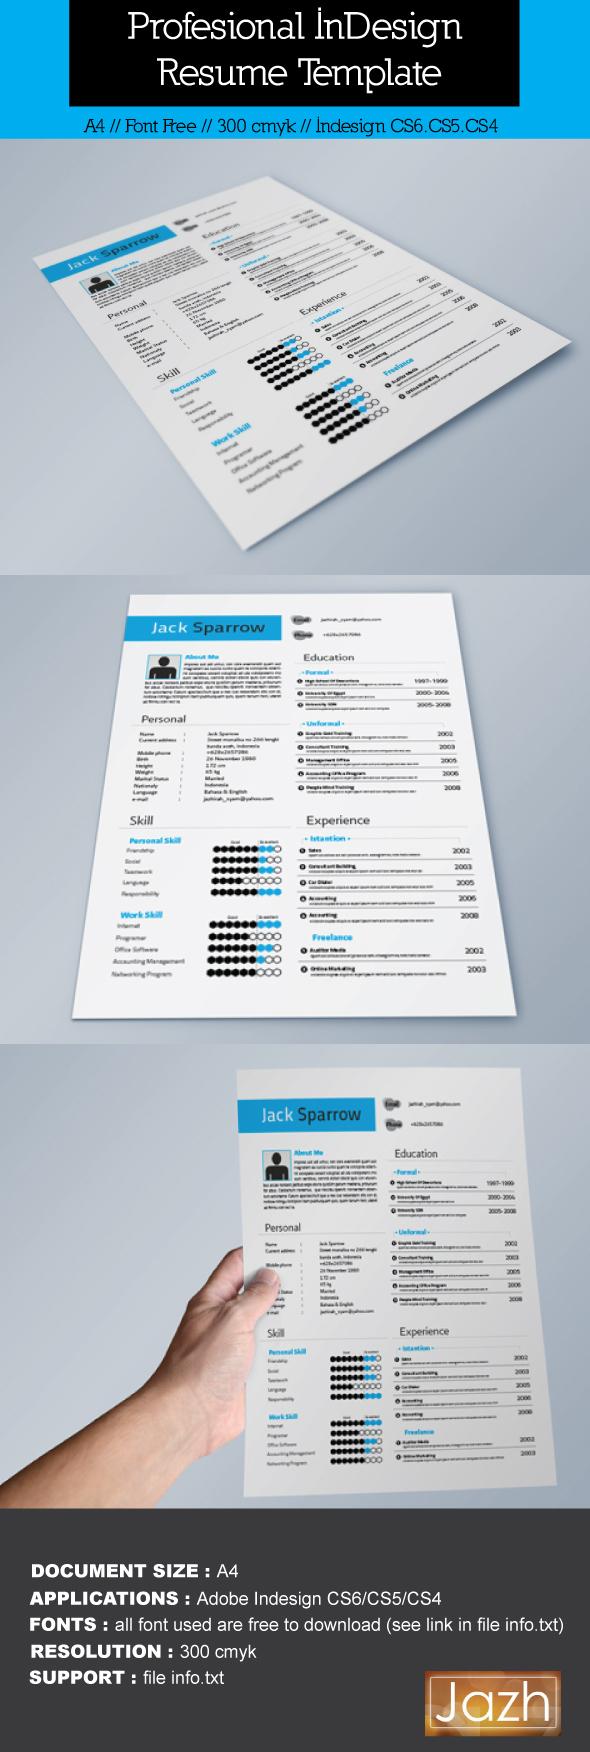 indesign resume cv templates free indesign resume resume template